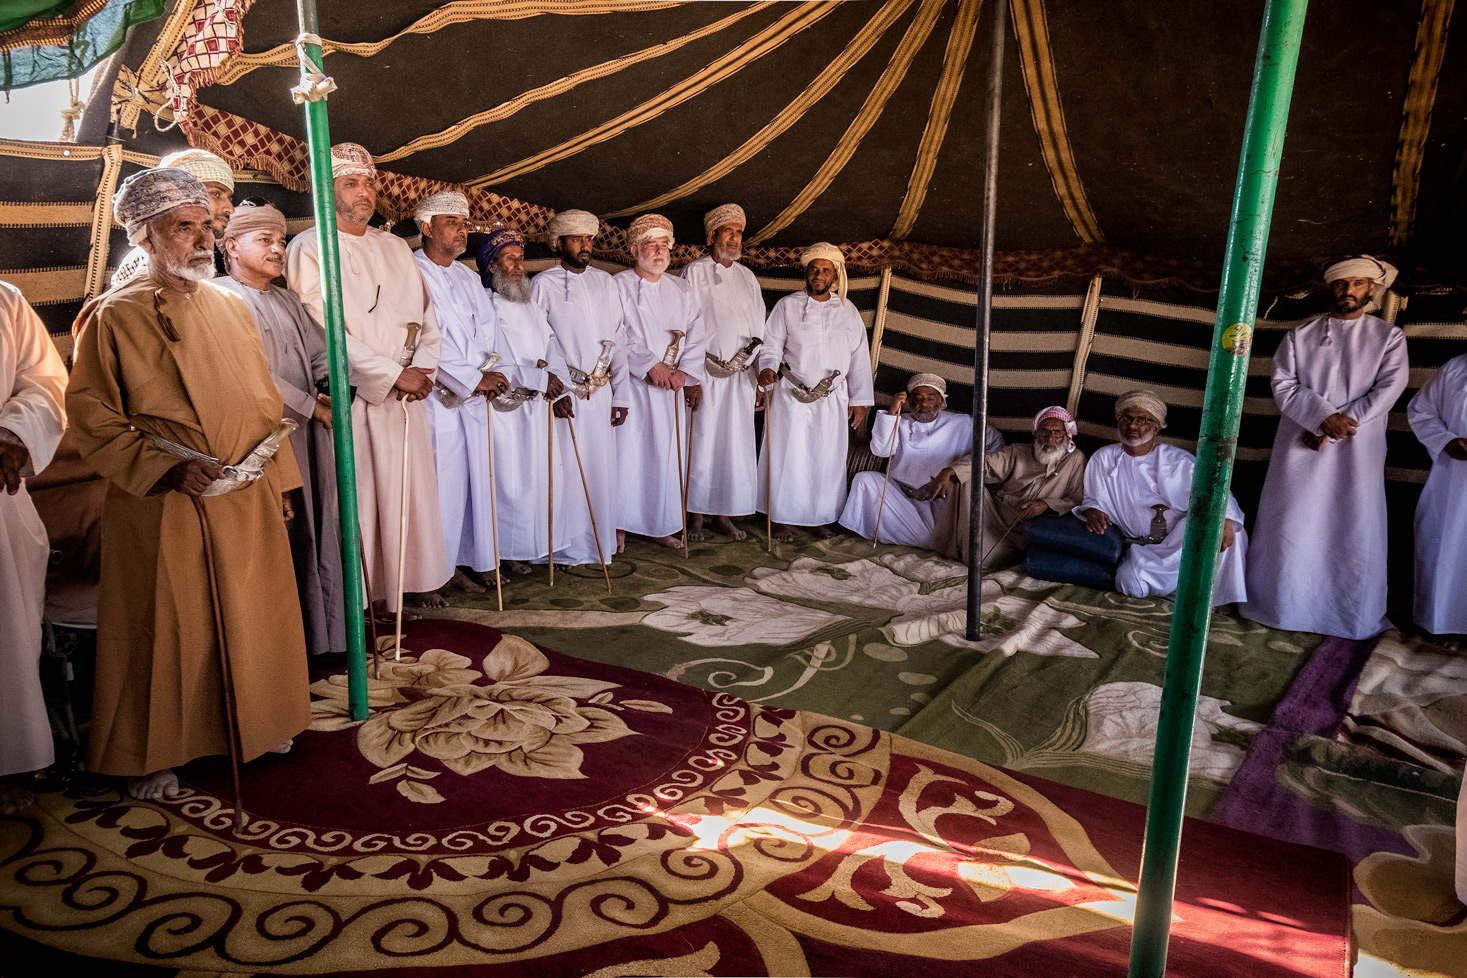 Bedouin_gathering_in_al_hashman_oman.jpg